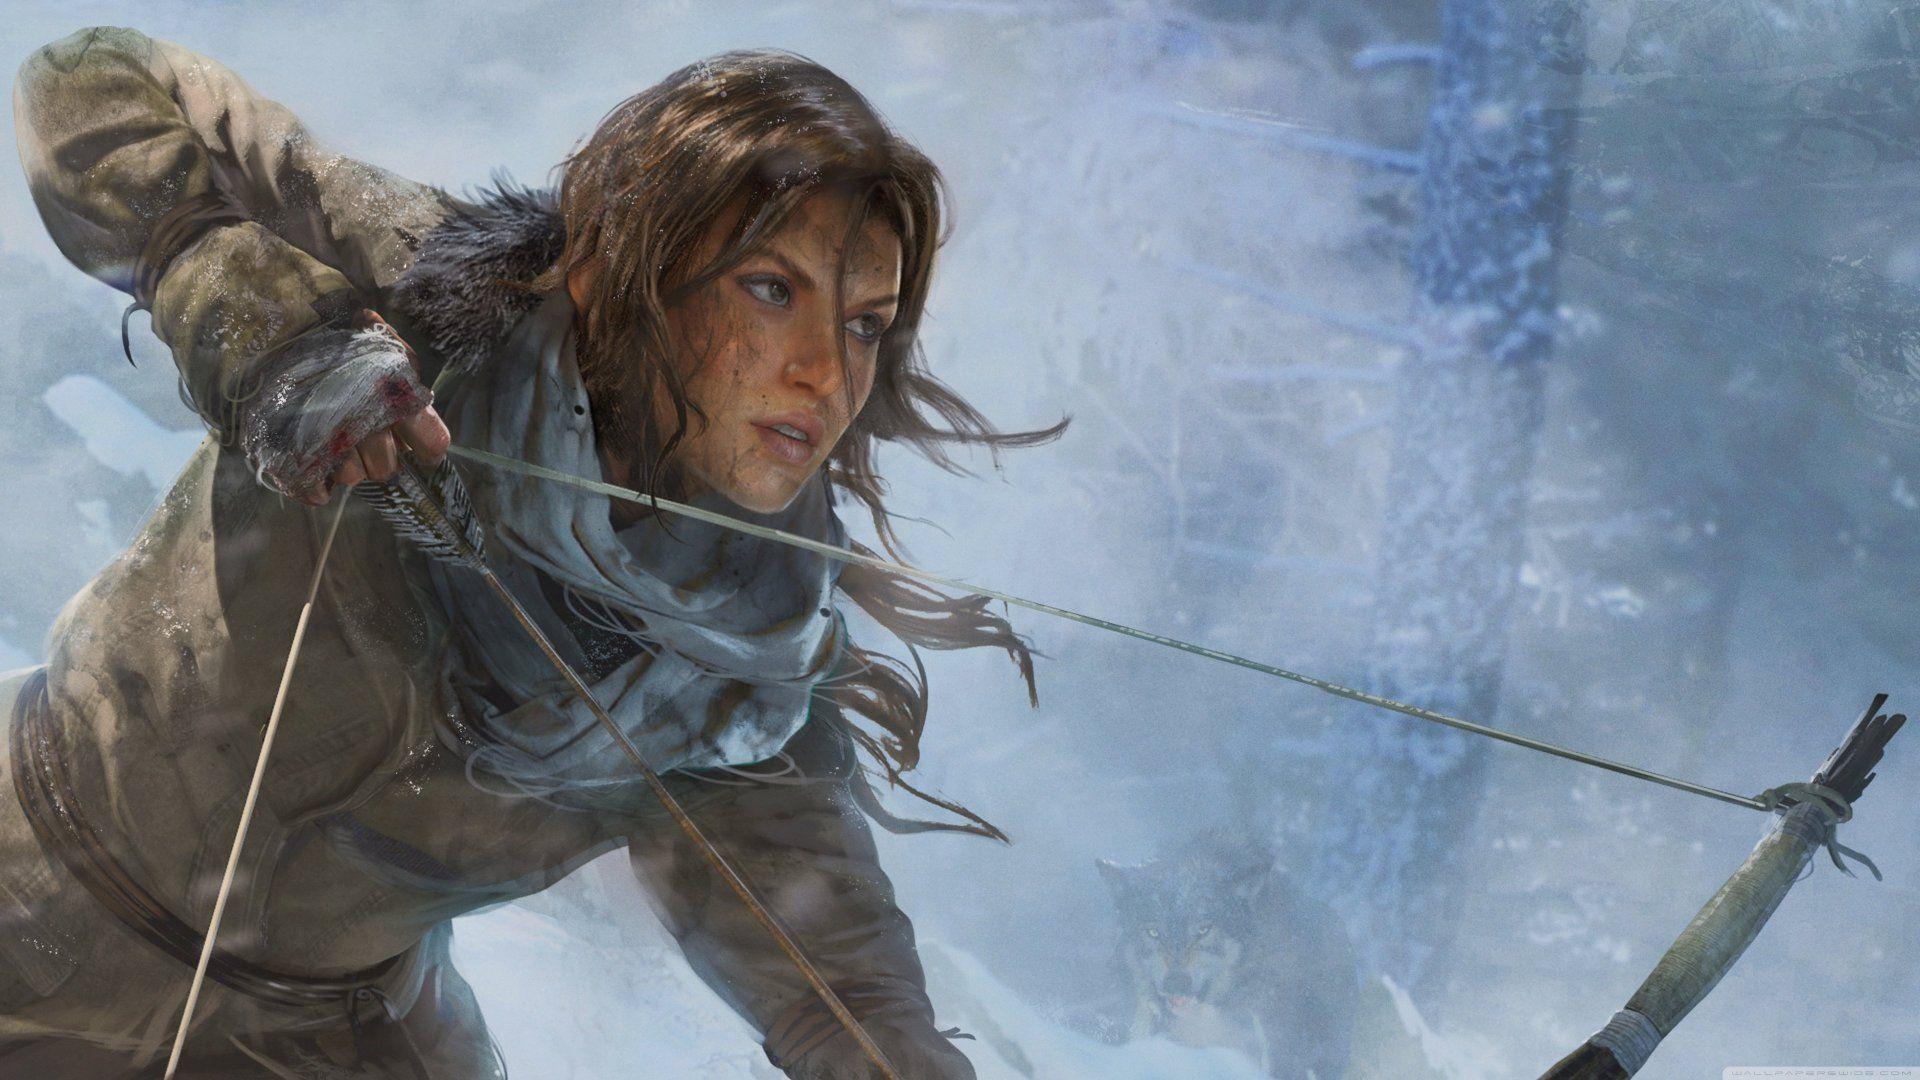 RISE_TOMB_RAIDER_lara_croft_action_adventure_mystery_1rtr_archer_warrior_fantasy_d_3840x2160.jpg